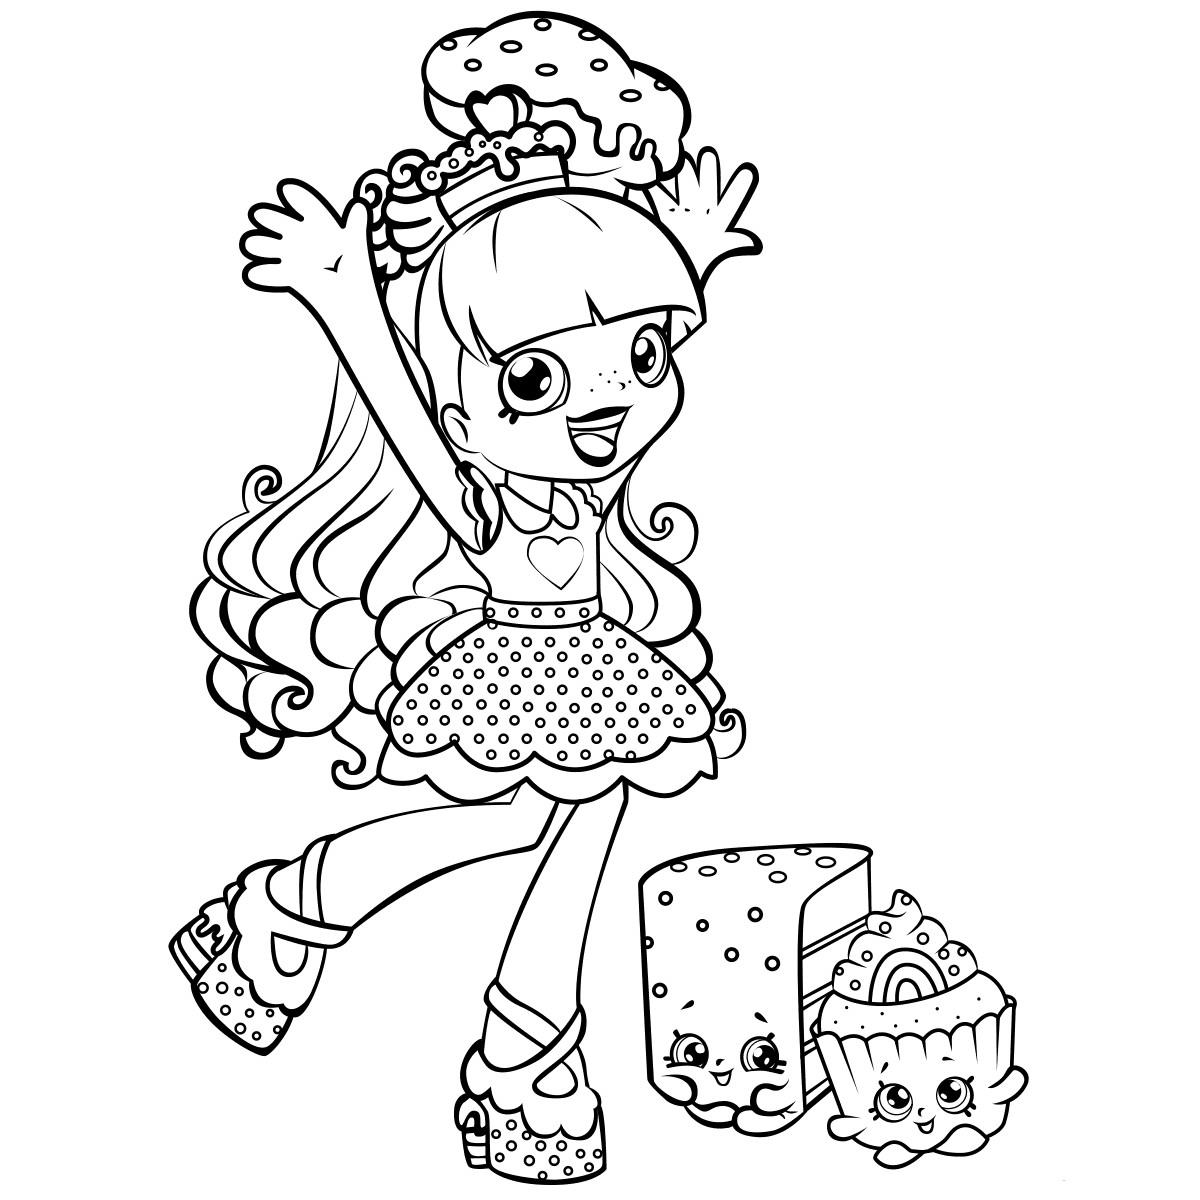 Best ideas about Coloring Pages For Girls Shopkins Season 5 . Save or Pin Baú da Web 12 Desenhos Shopkins para colorir Now.